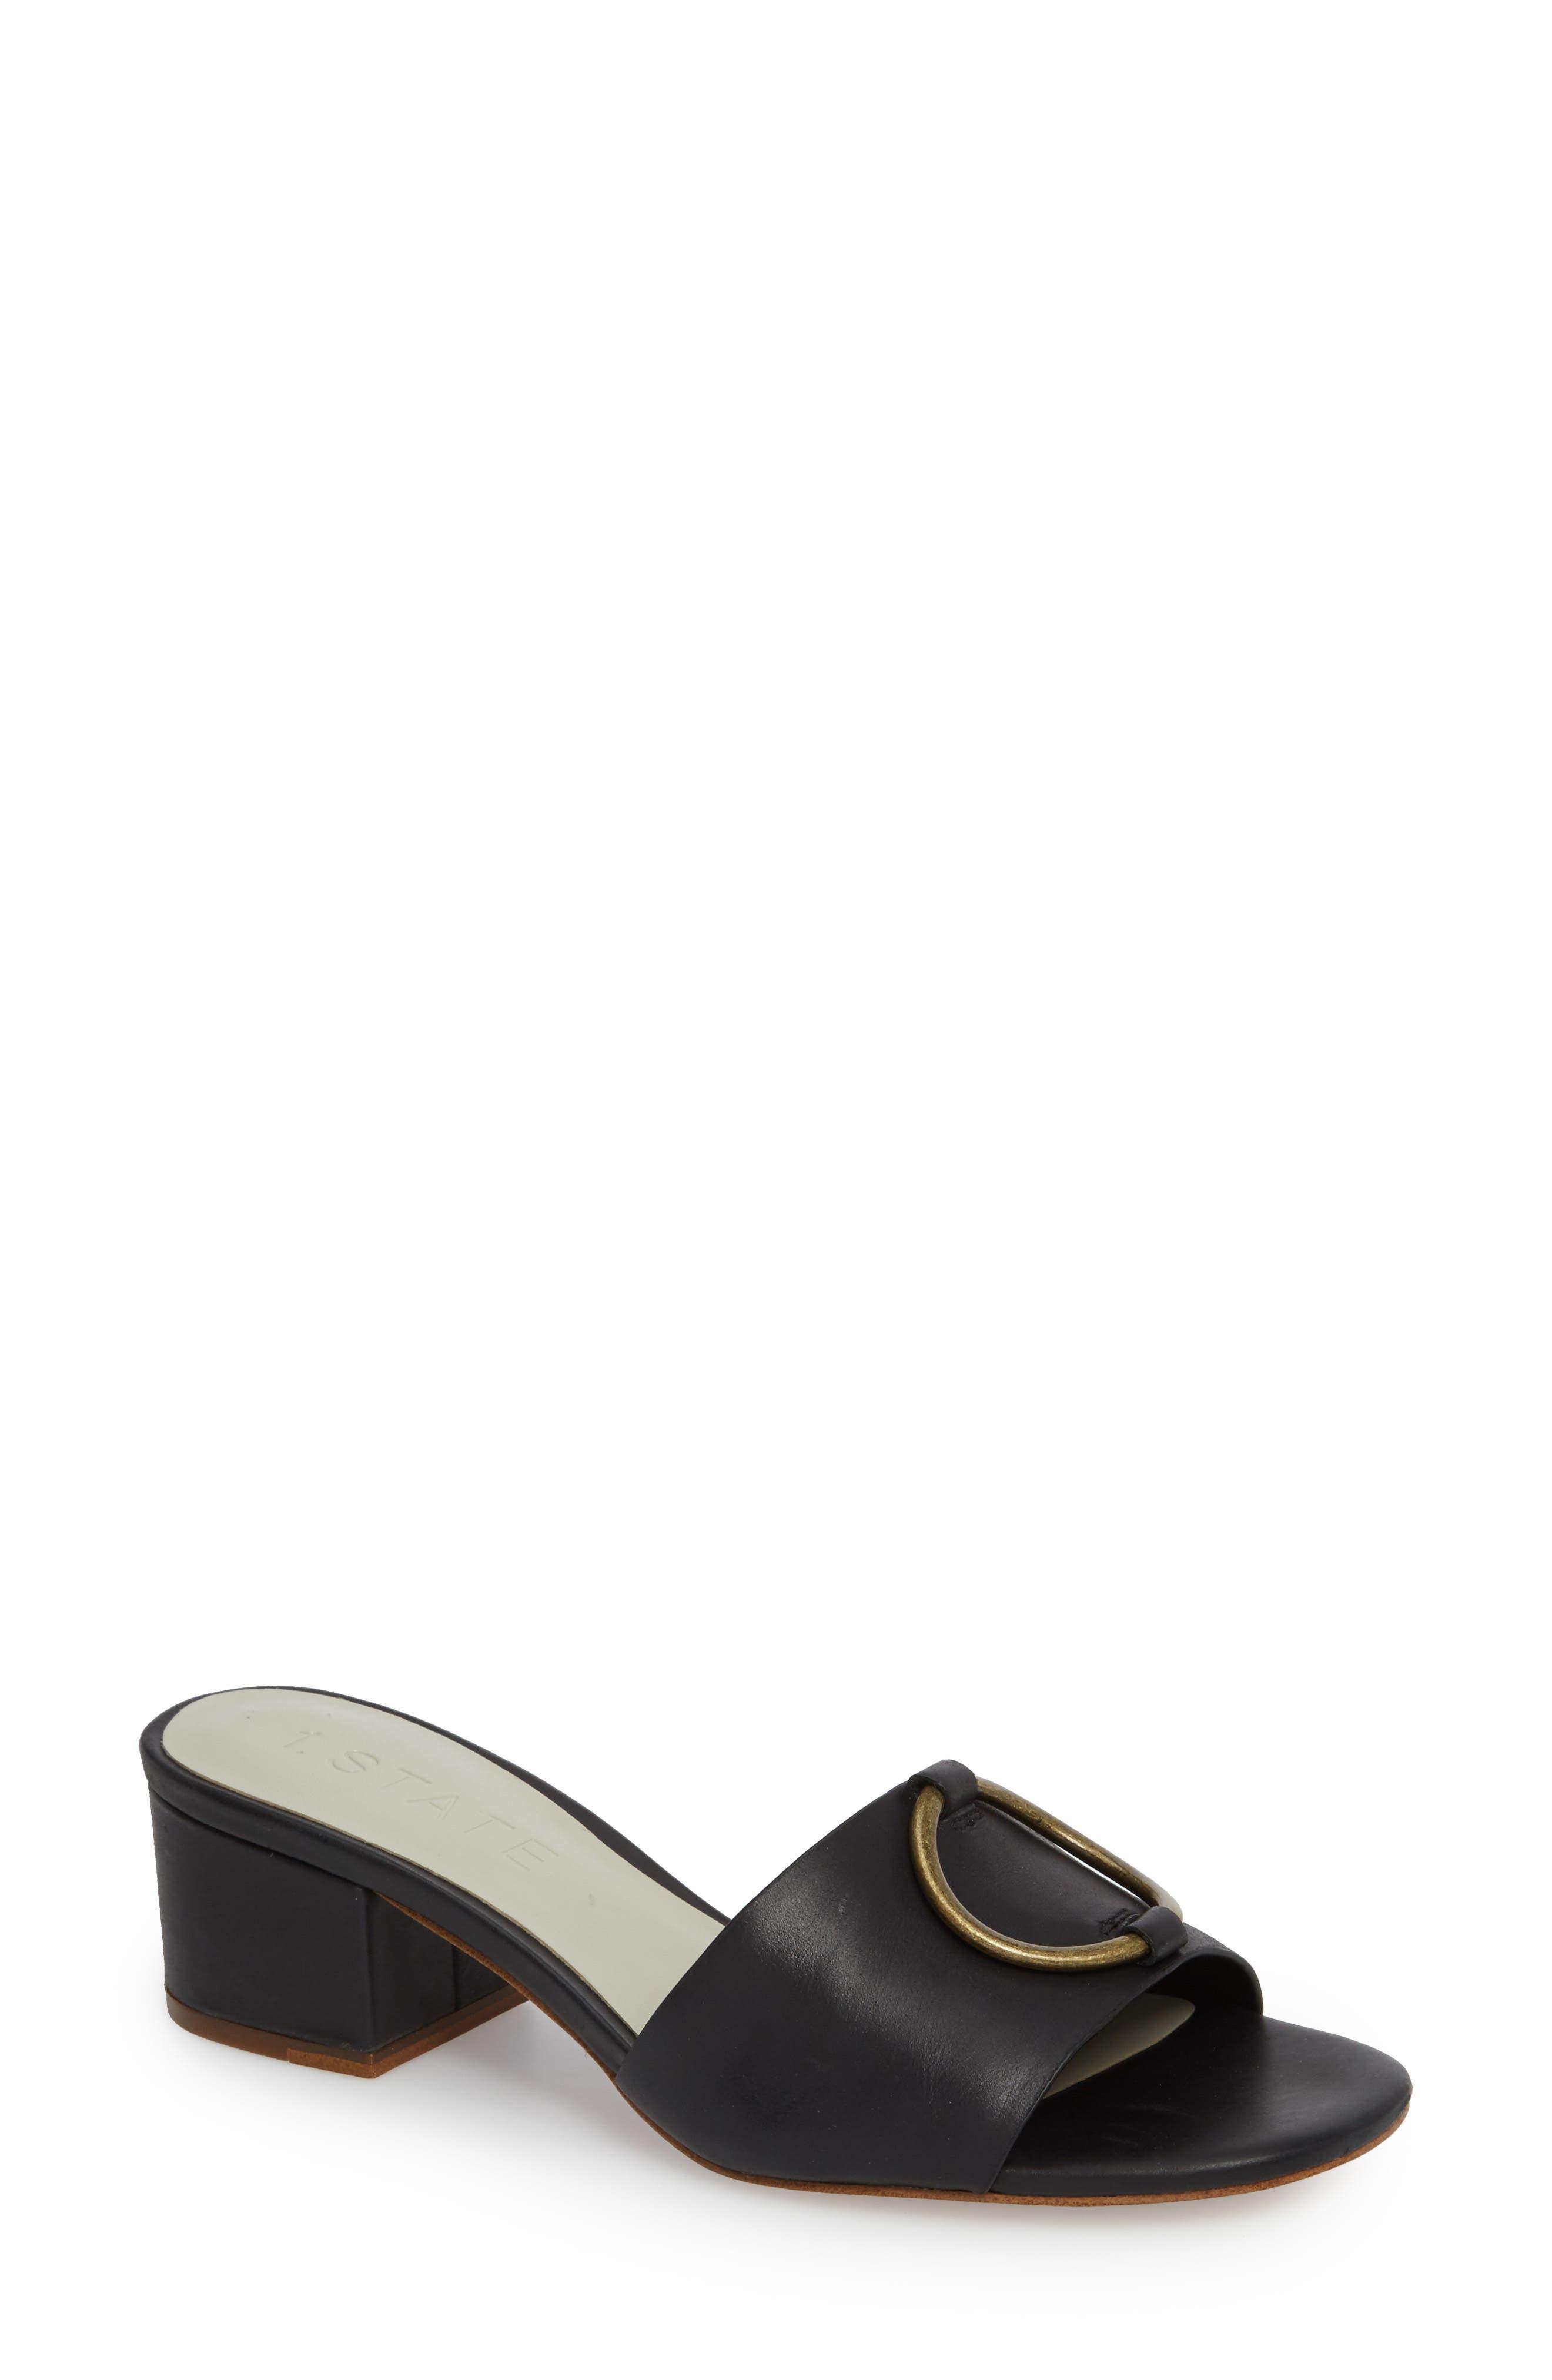 Jacale Slide Sandal,                             Main thumbnail 1, color,                             001